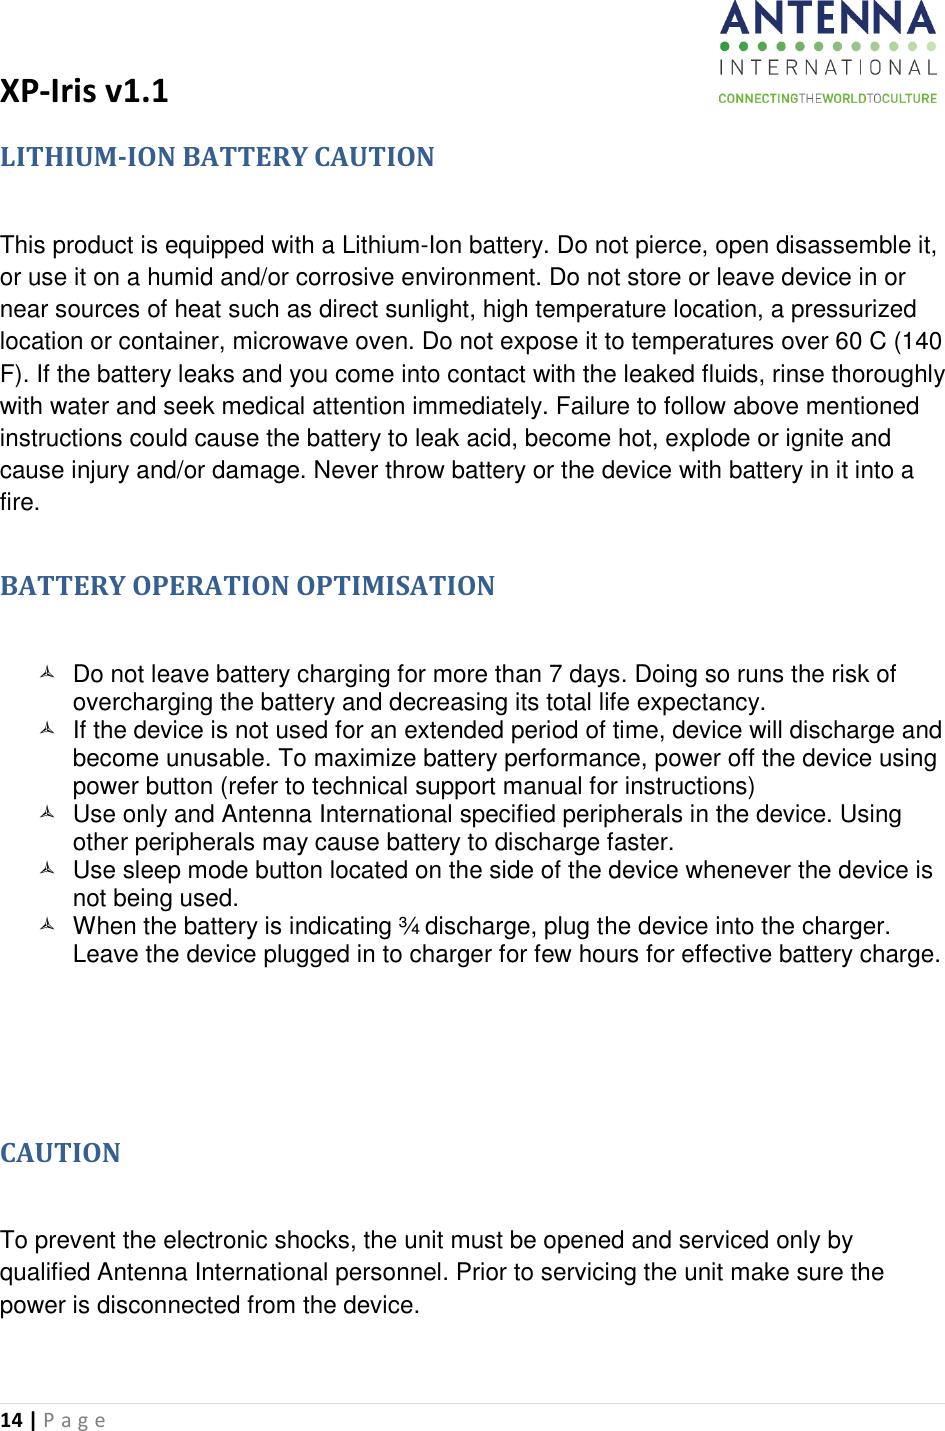 Antenna XP11-1 XP-IRIS TM User Manual manual